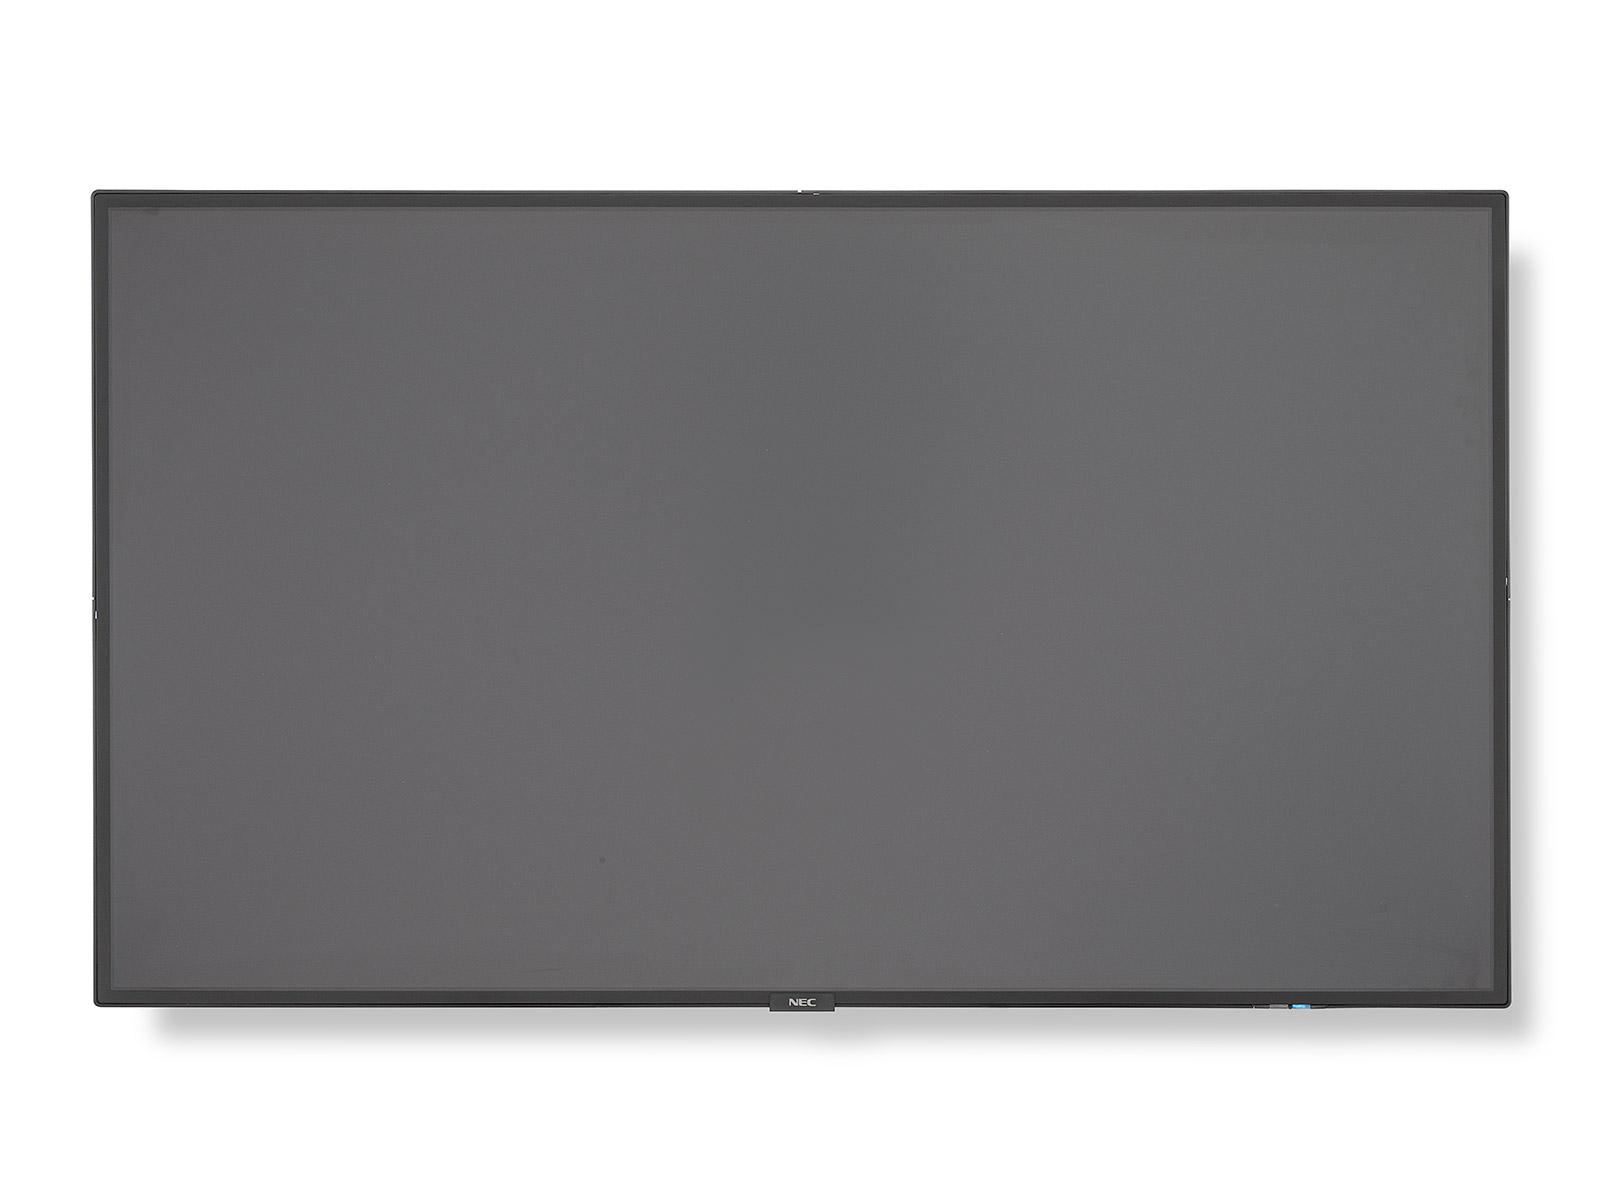 "MultiSync® V484 LCD 48"" Midrange Large Format Display"